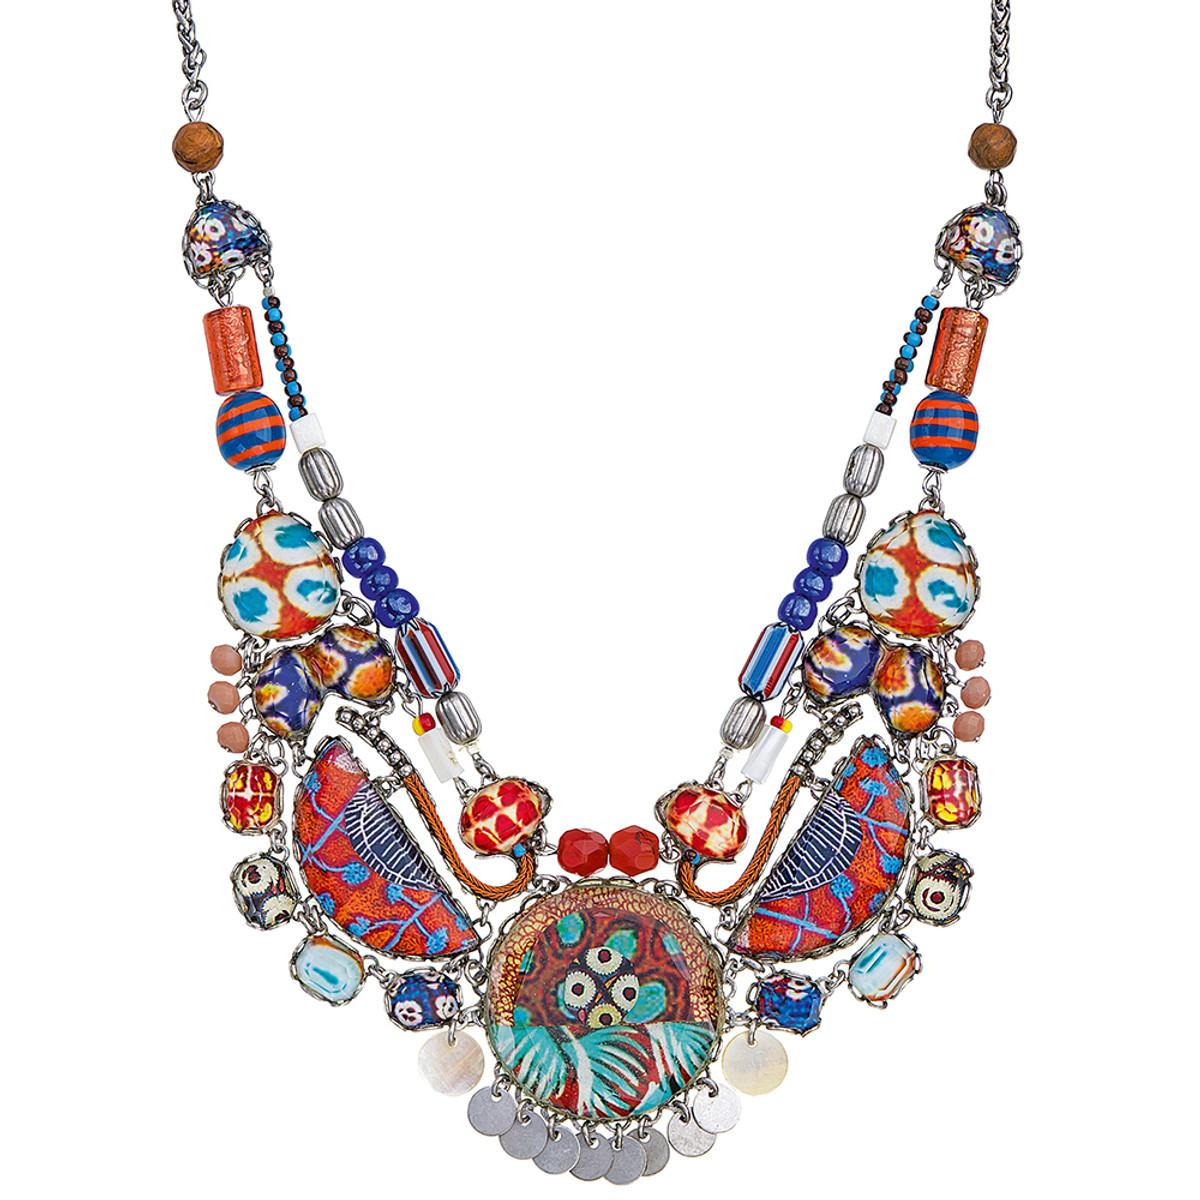 Ayala Bar Afro-Desia Electricity Necklace